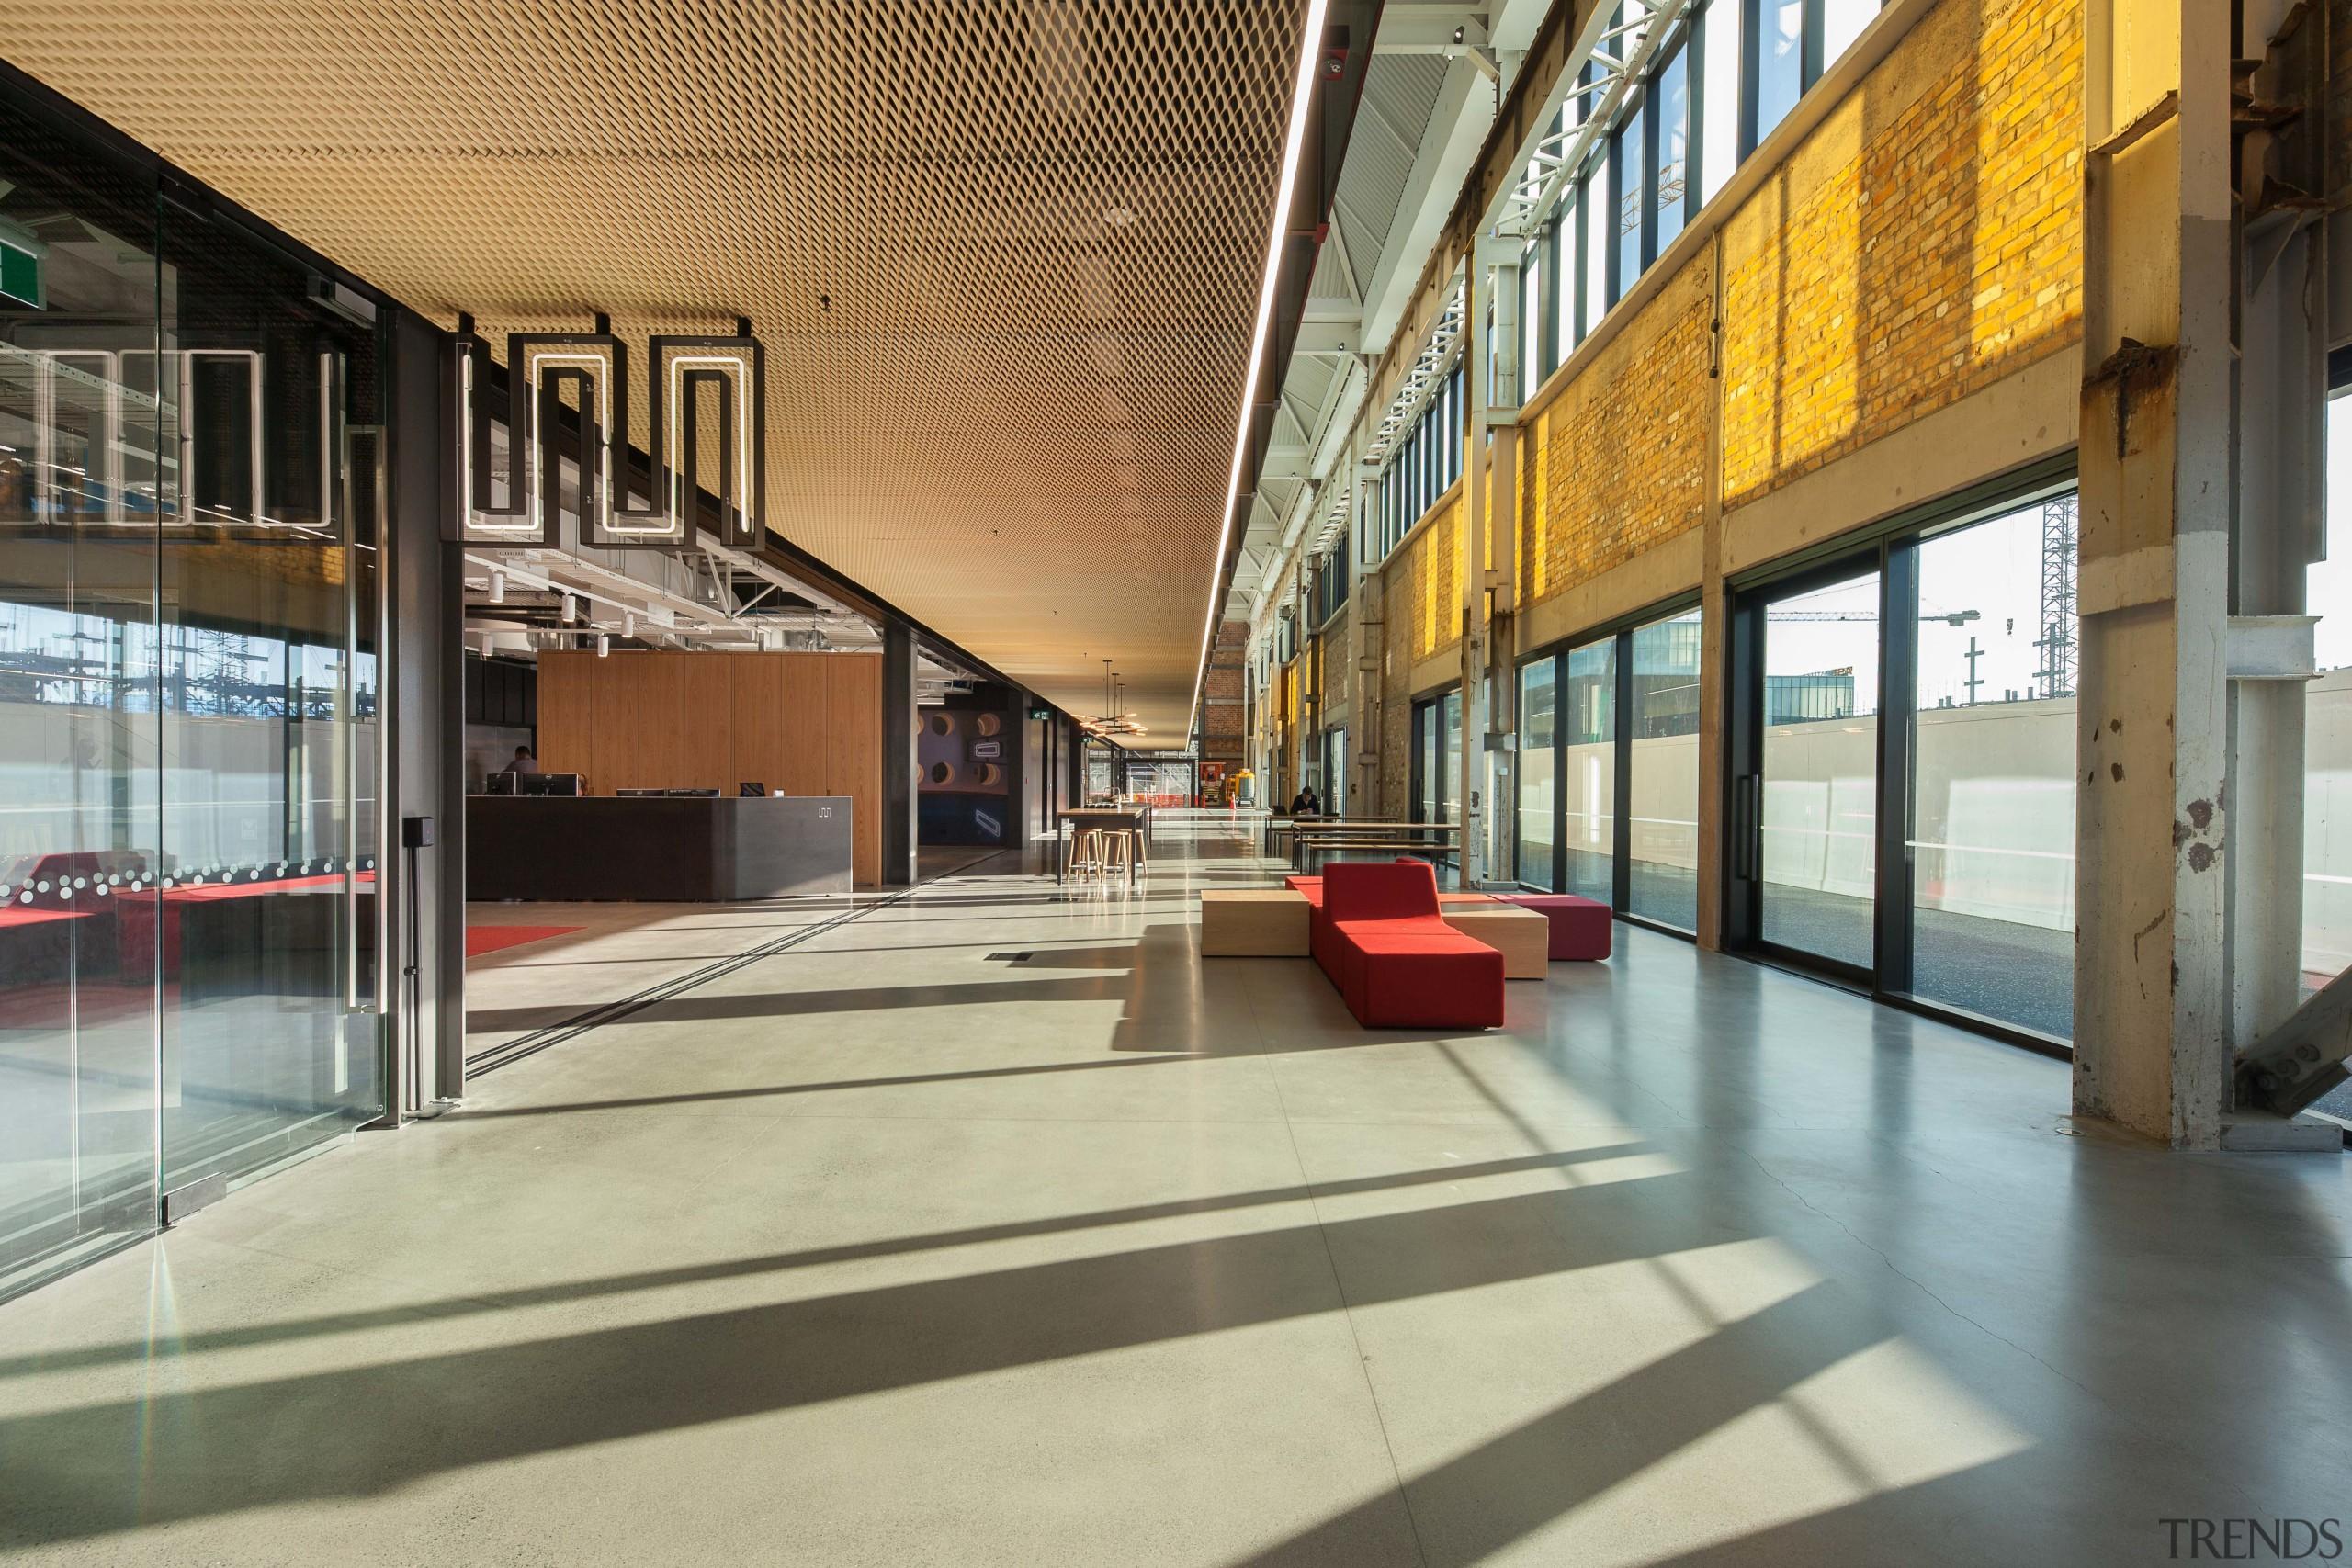 The Mason Bros interiors inlcudes the new Warren architecture, building, daylighting, interior design, lobby, metropolitan area, shopping mall, gray